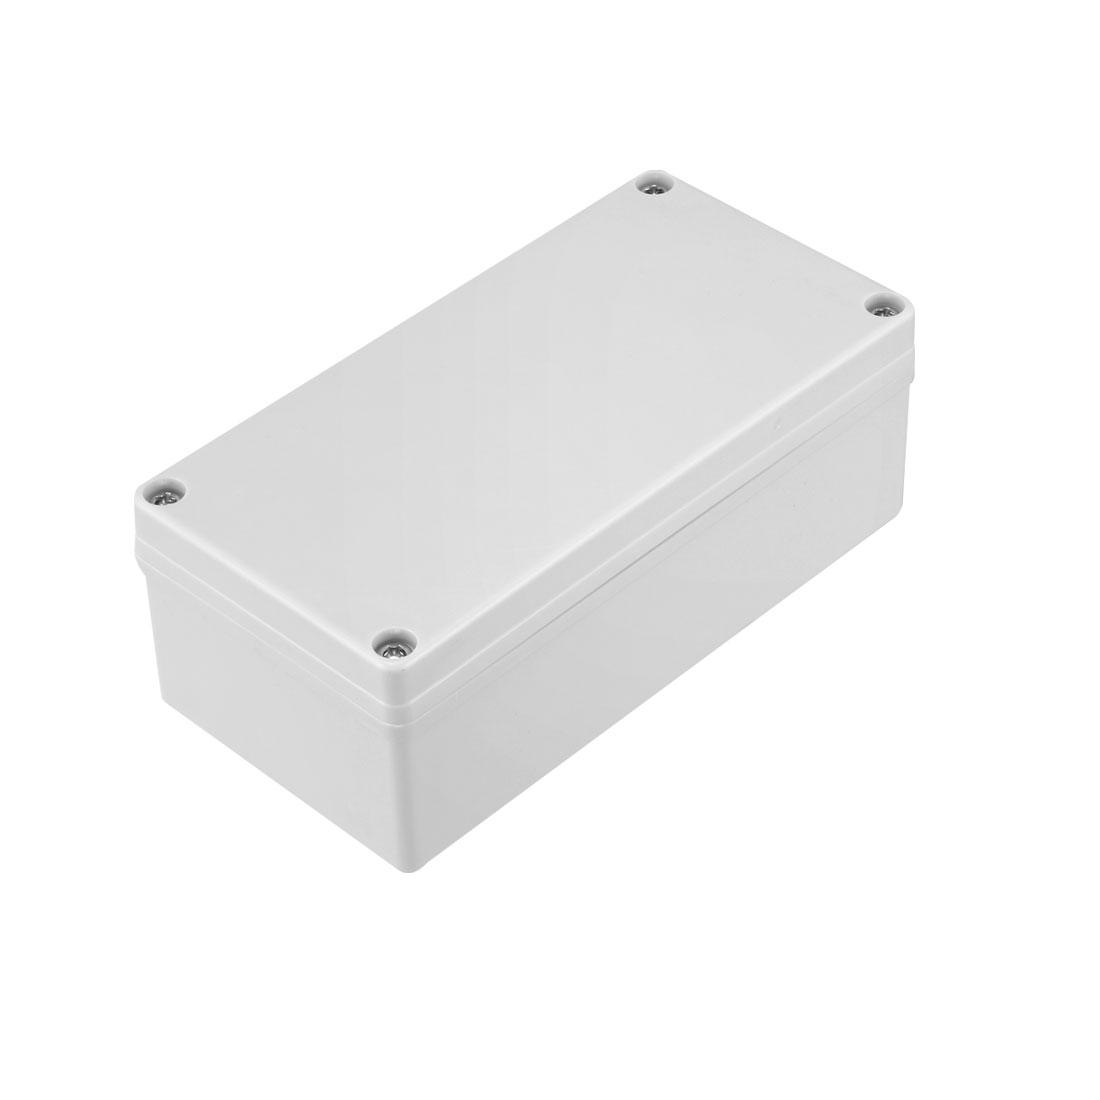 80 x 160 x 60mm Electronic ABS Plastic DIY Junction Box Enclosure Case Grey